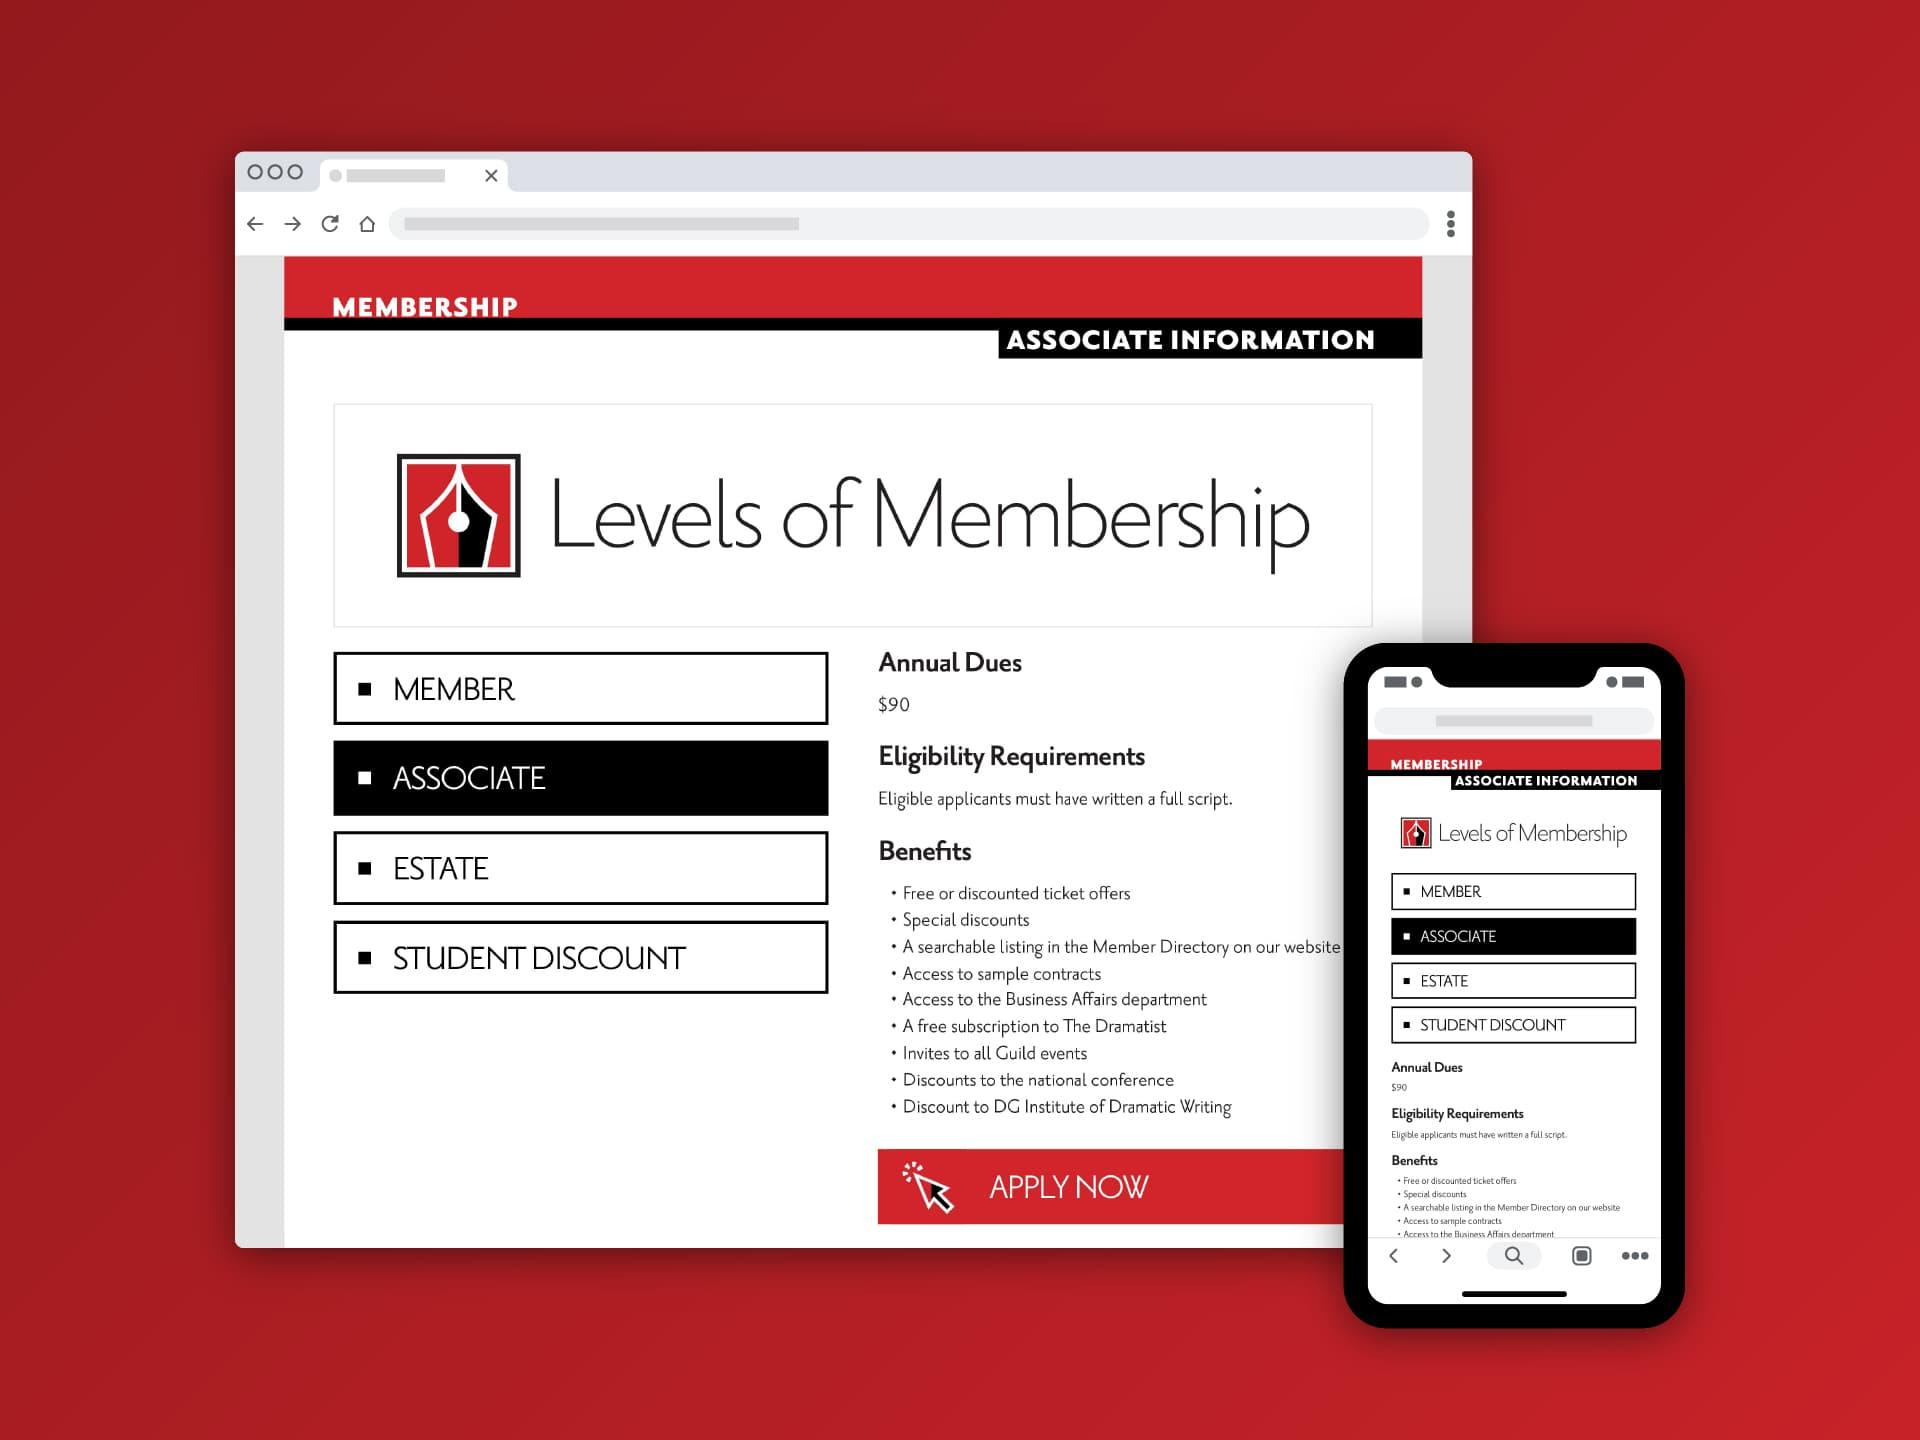 Levels of Membership (Associate)